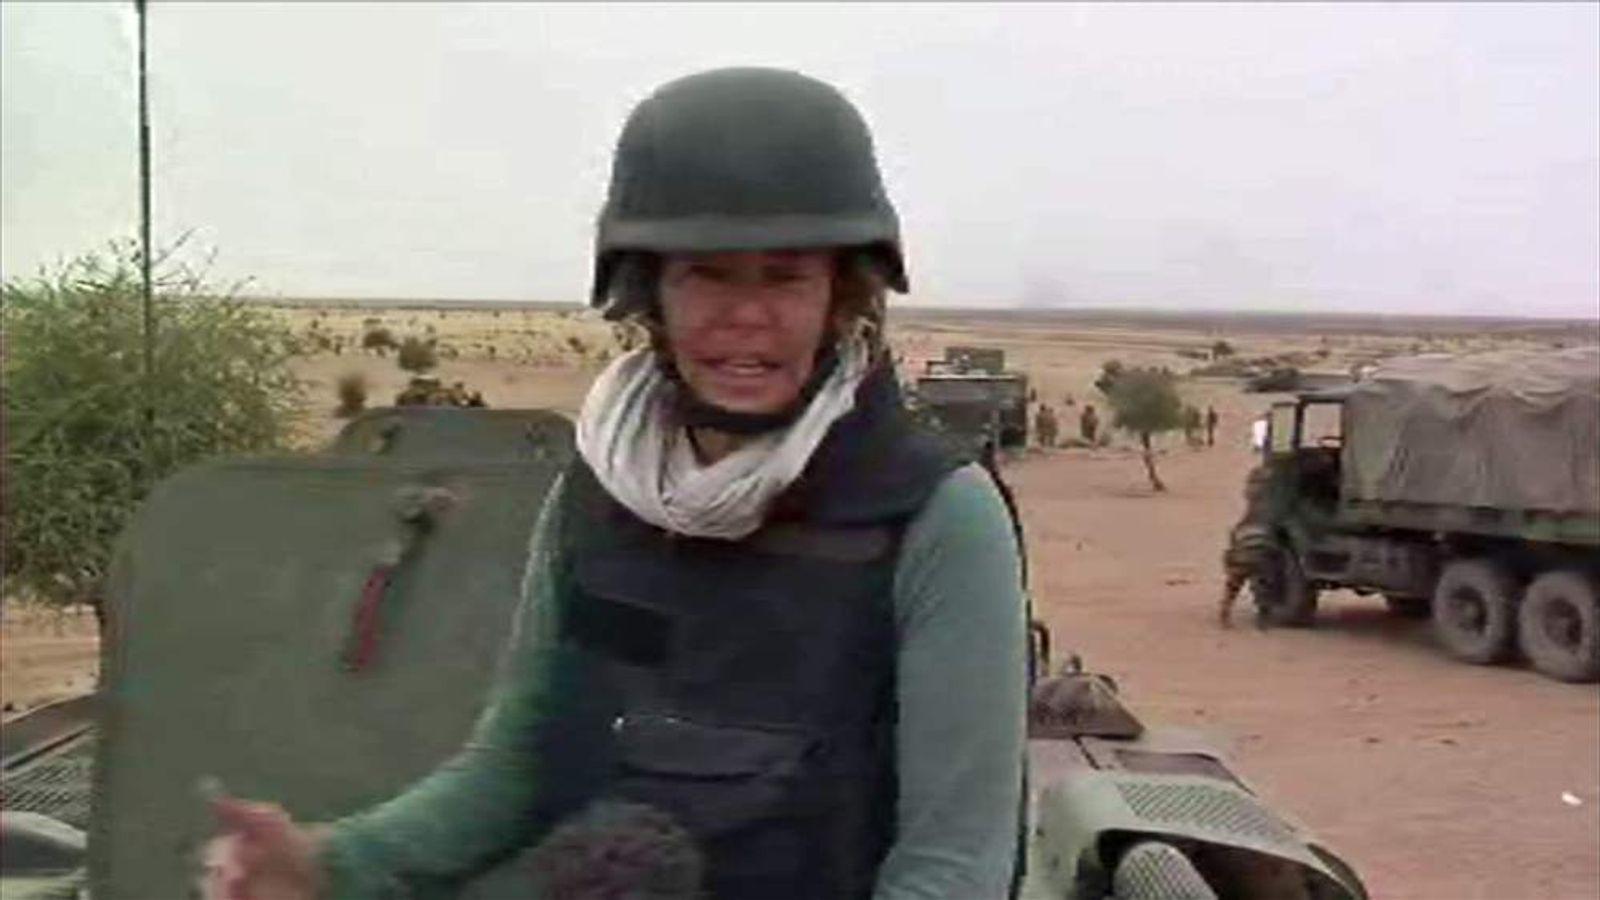 Alex Crawford in Mali